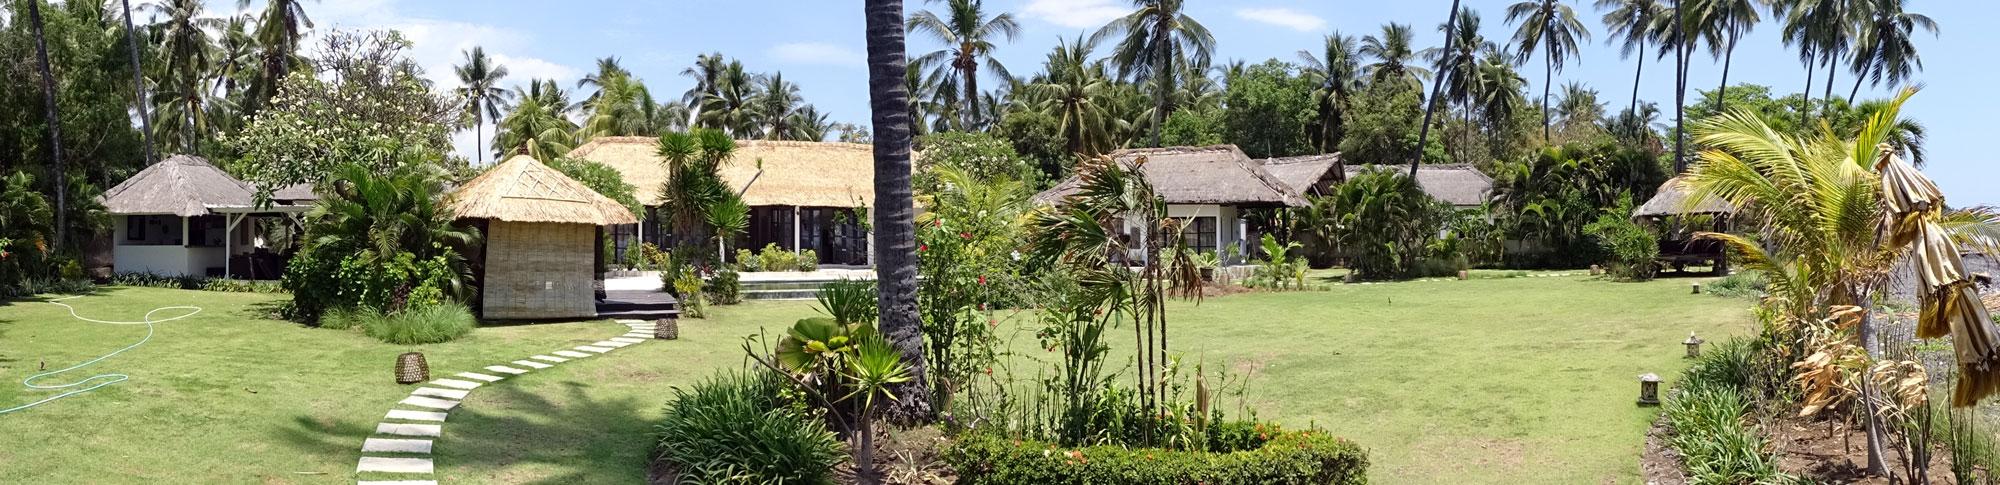 bali ocean front villa for sale